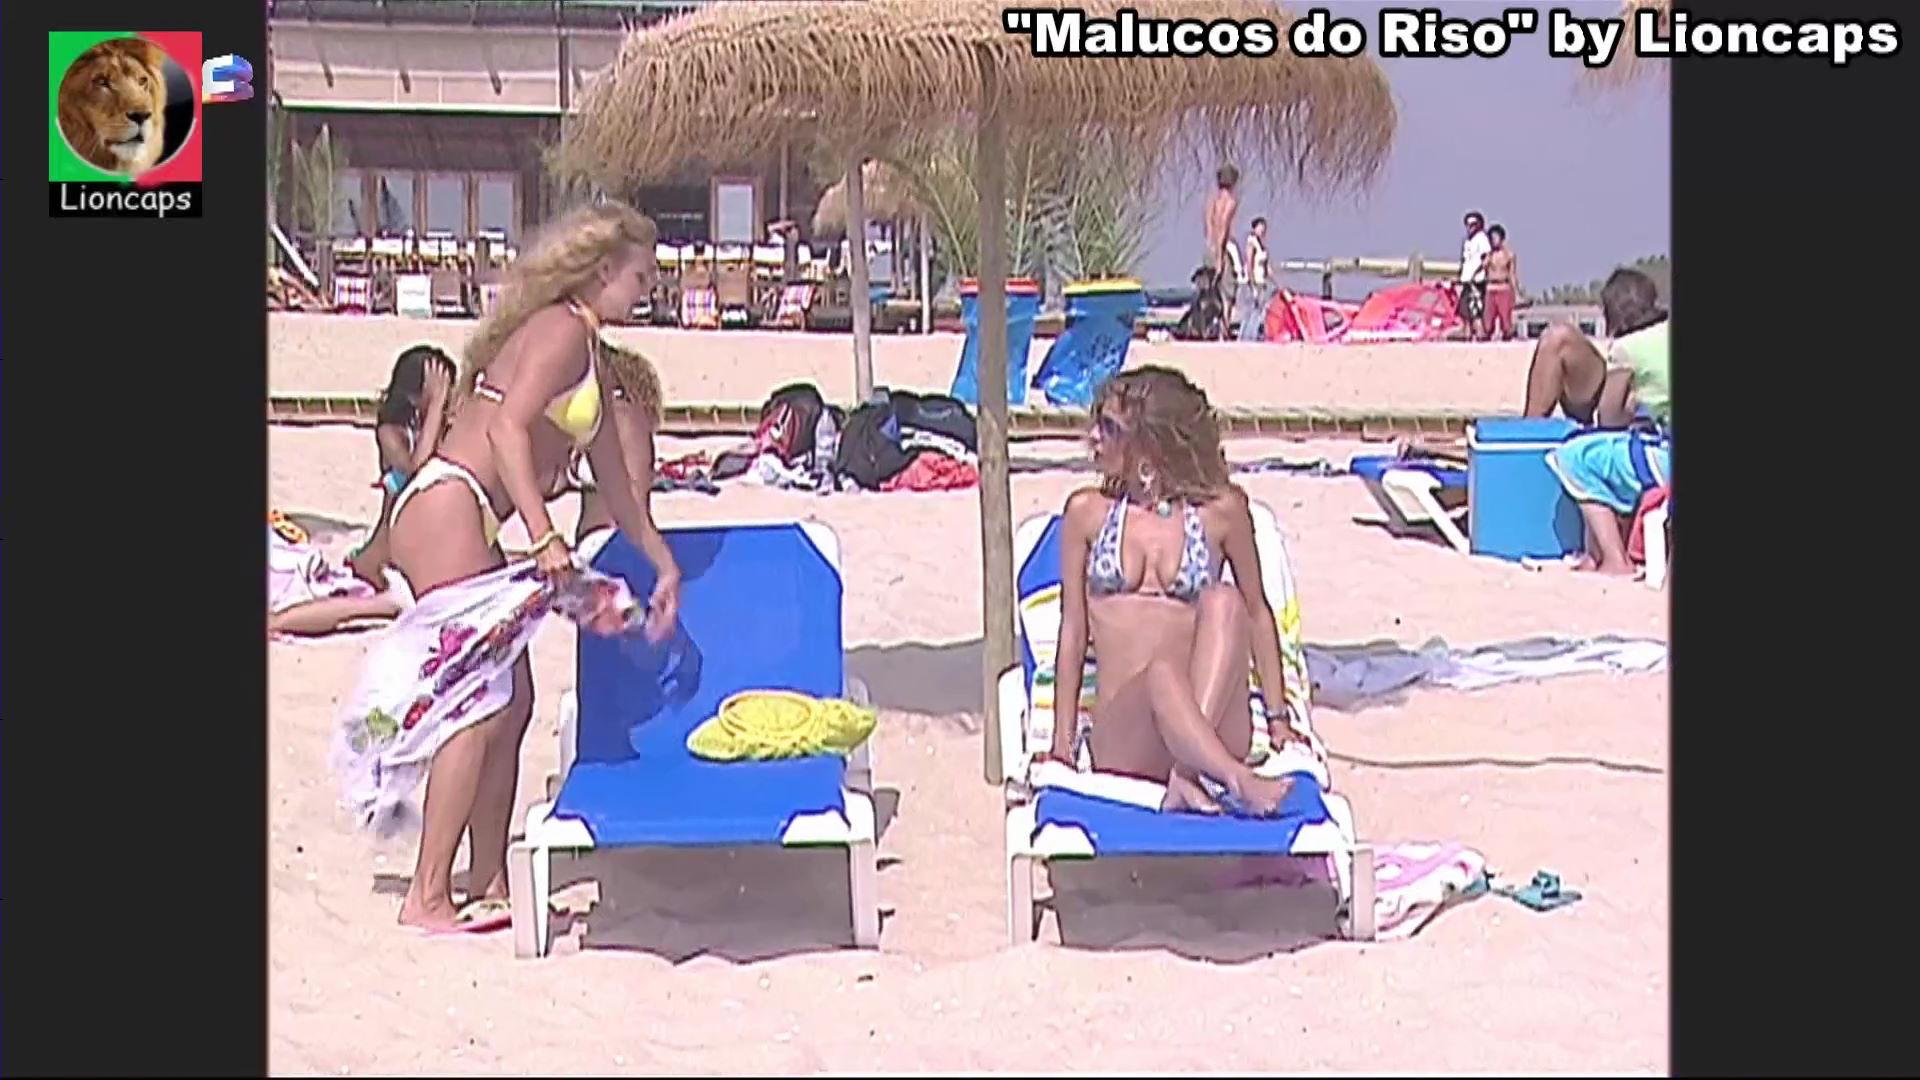 475188298_malucos_riso_alda_gomes_vs190malucos_riso_602_15089_122_343lo.JPG